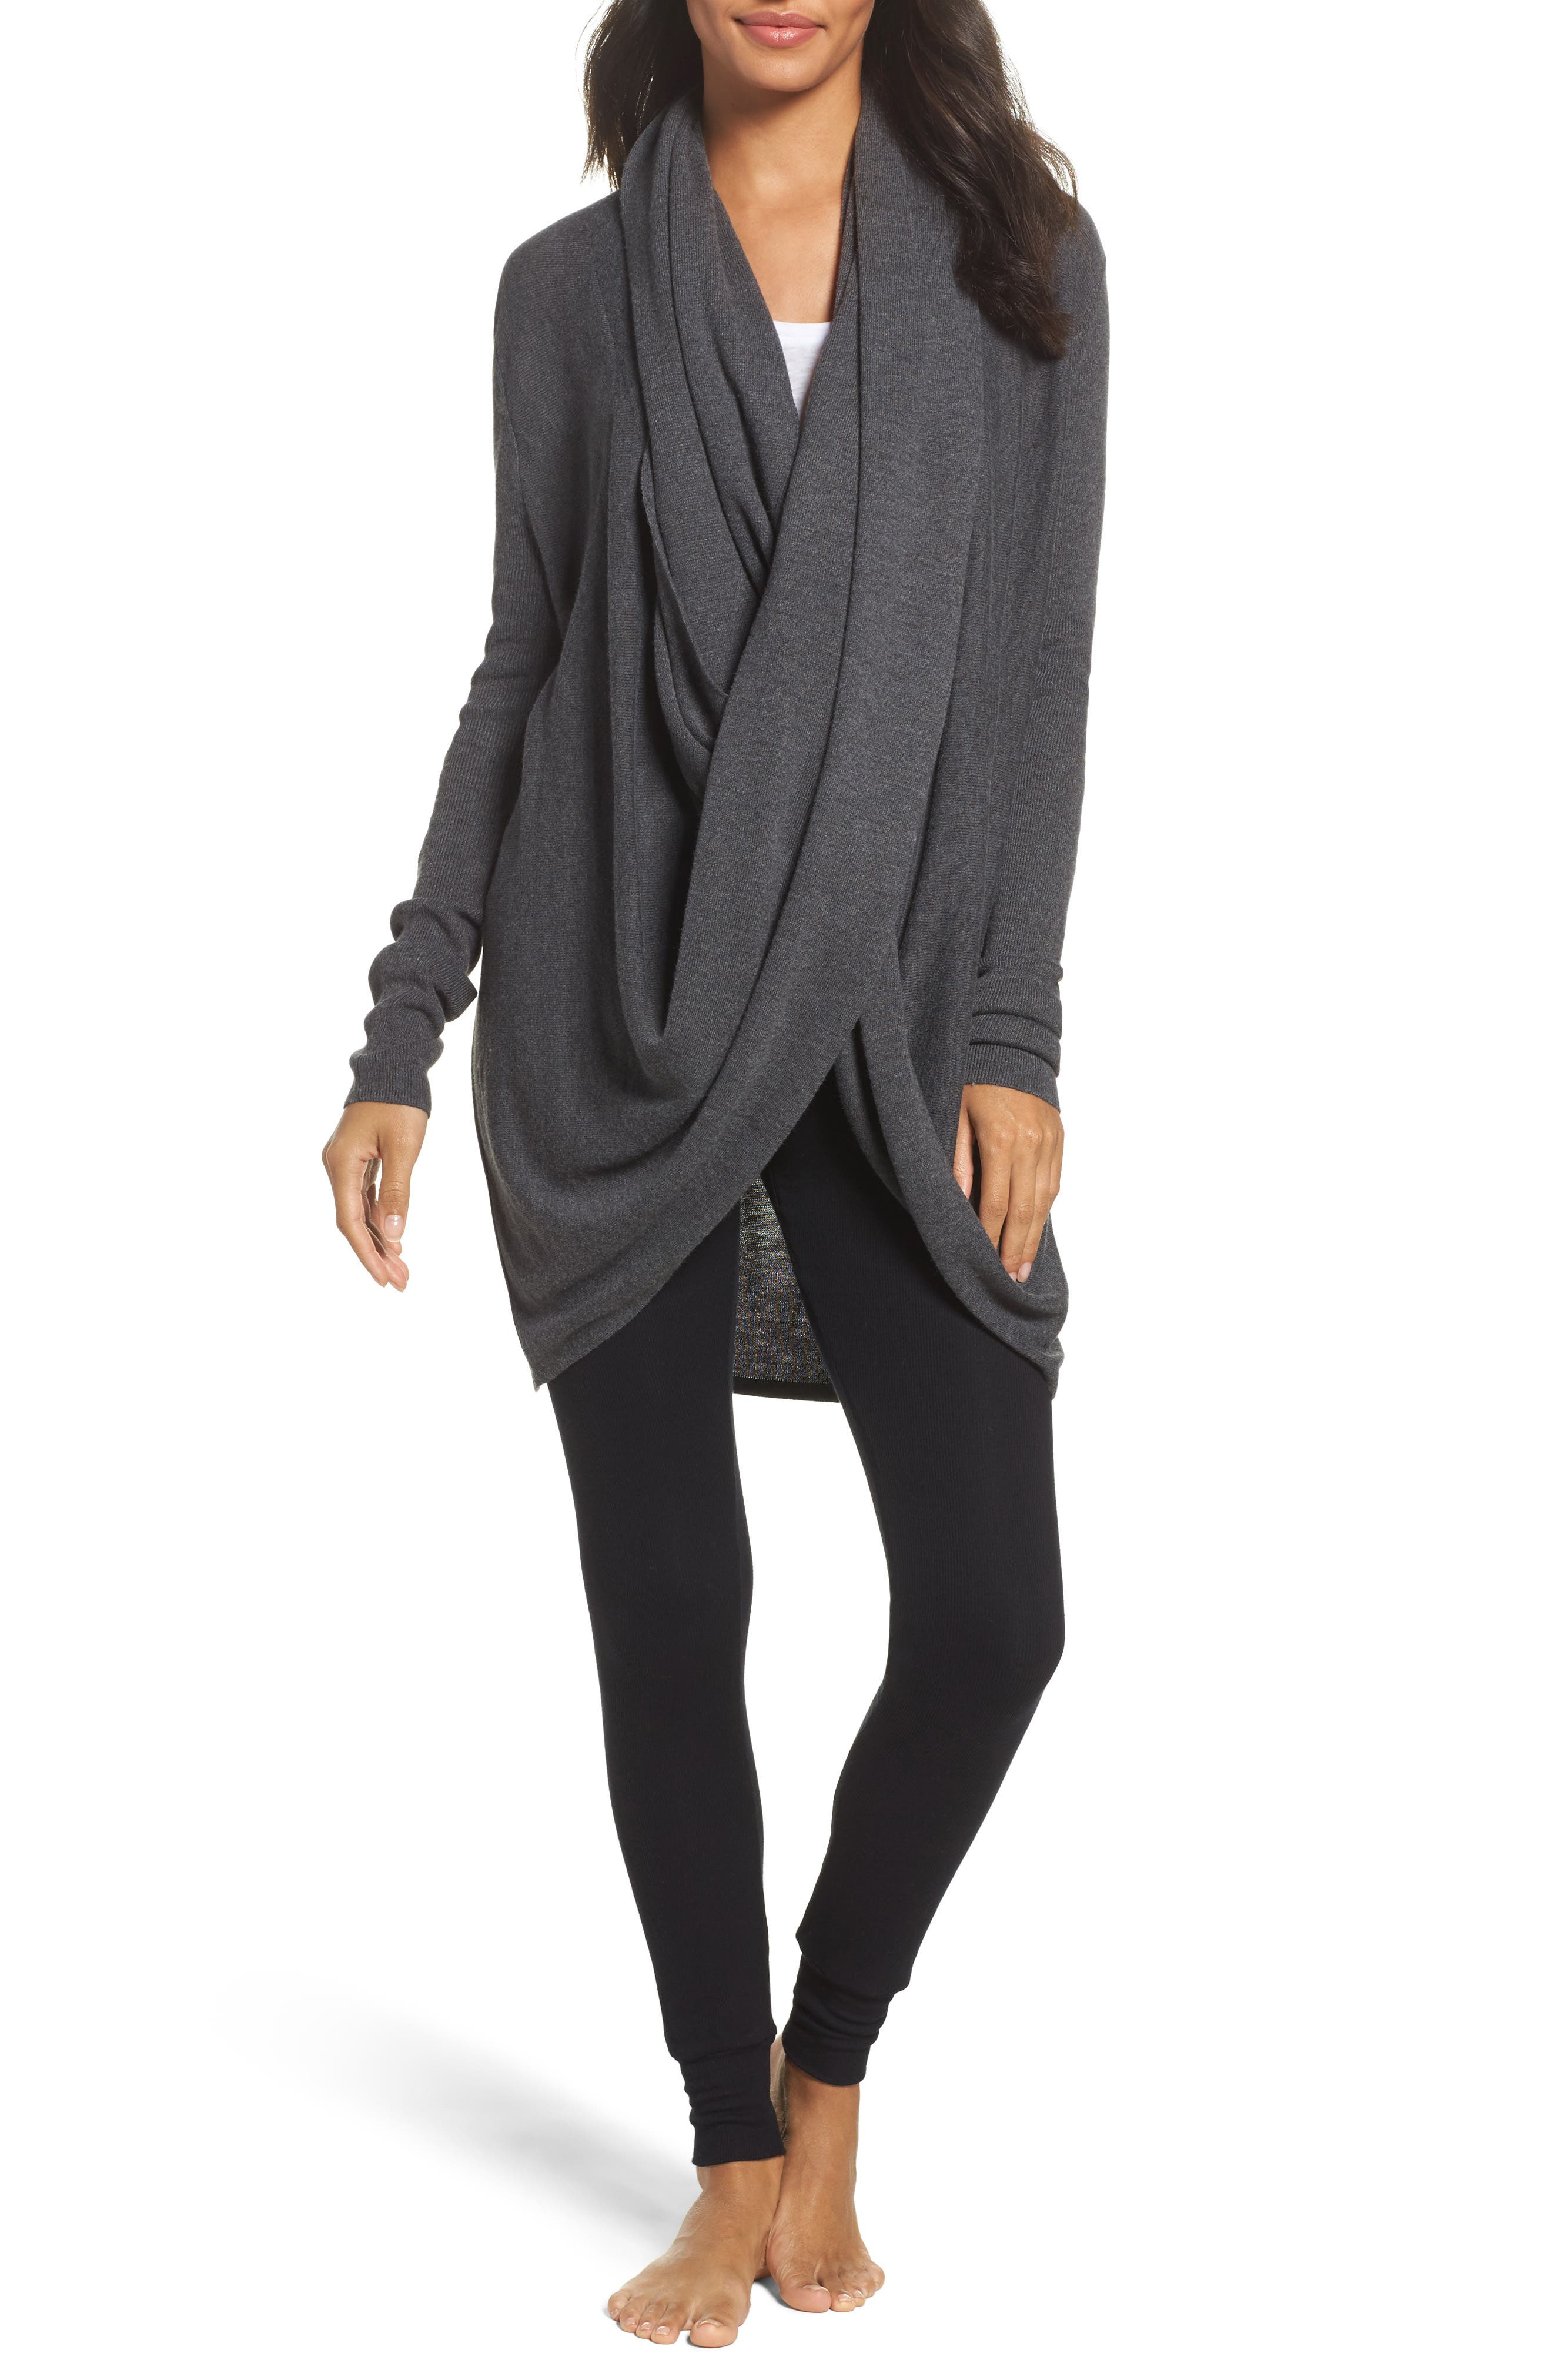 LongWrap Cardigan,                         Main,                         color, Grey Charcoal Heather